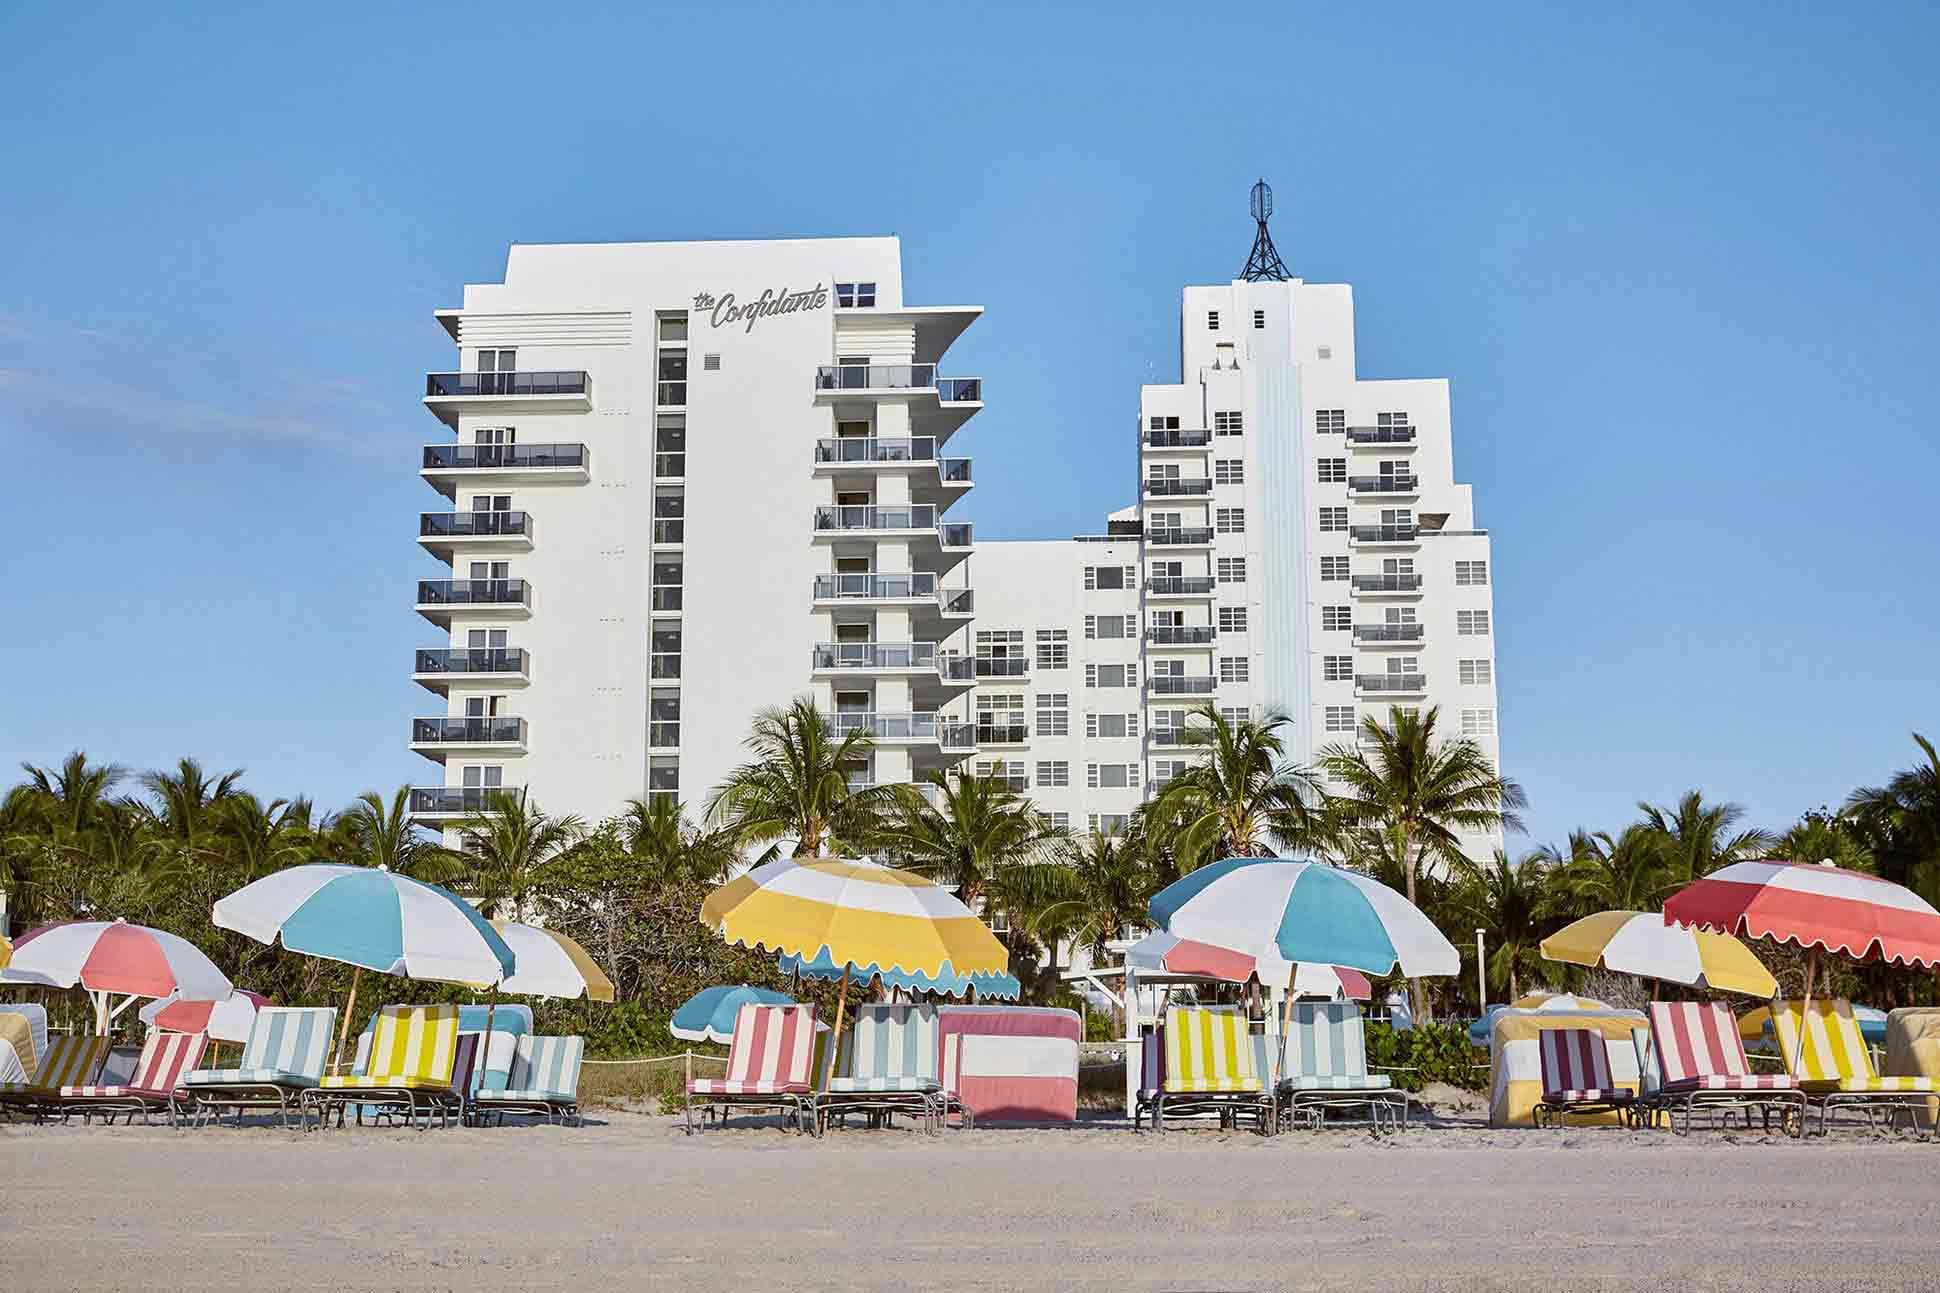 The Confidante Miami Beach Hotel Miami, Florida, USA